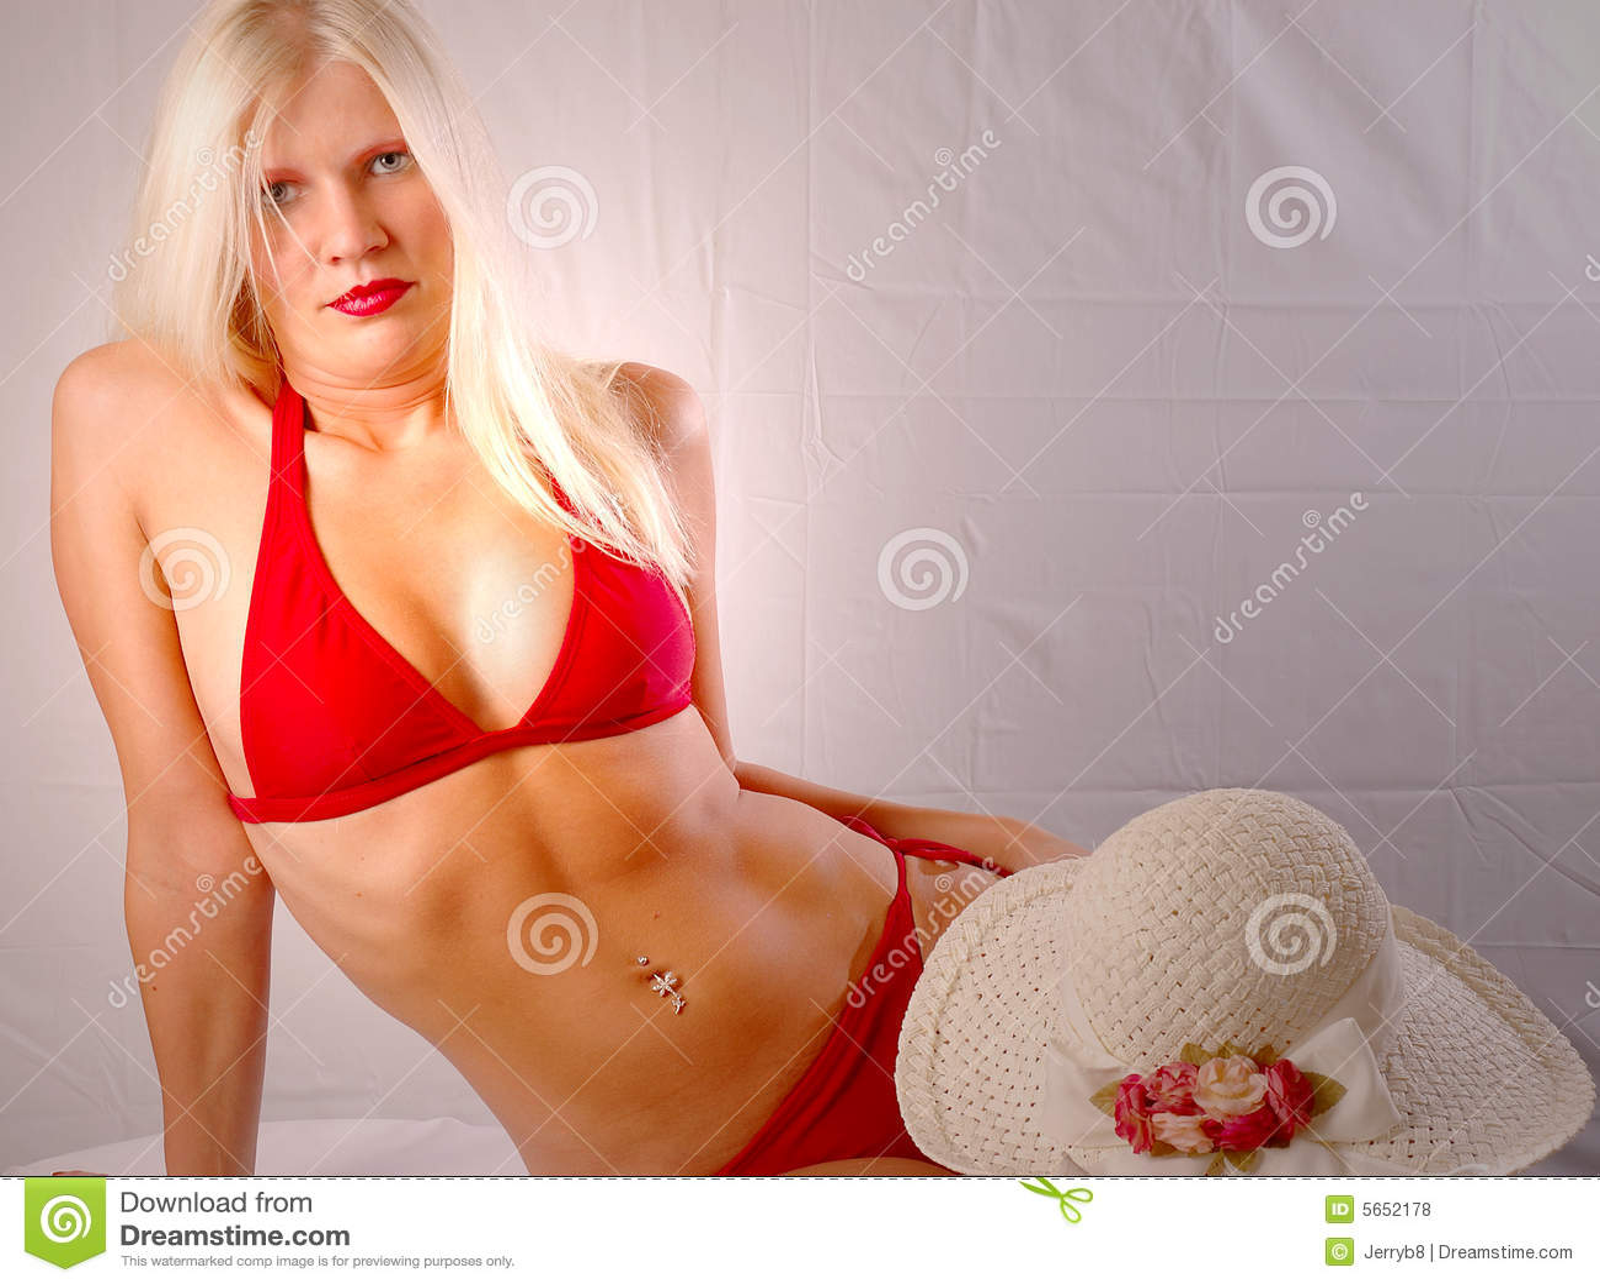 Blonde Red Bikini 78